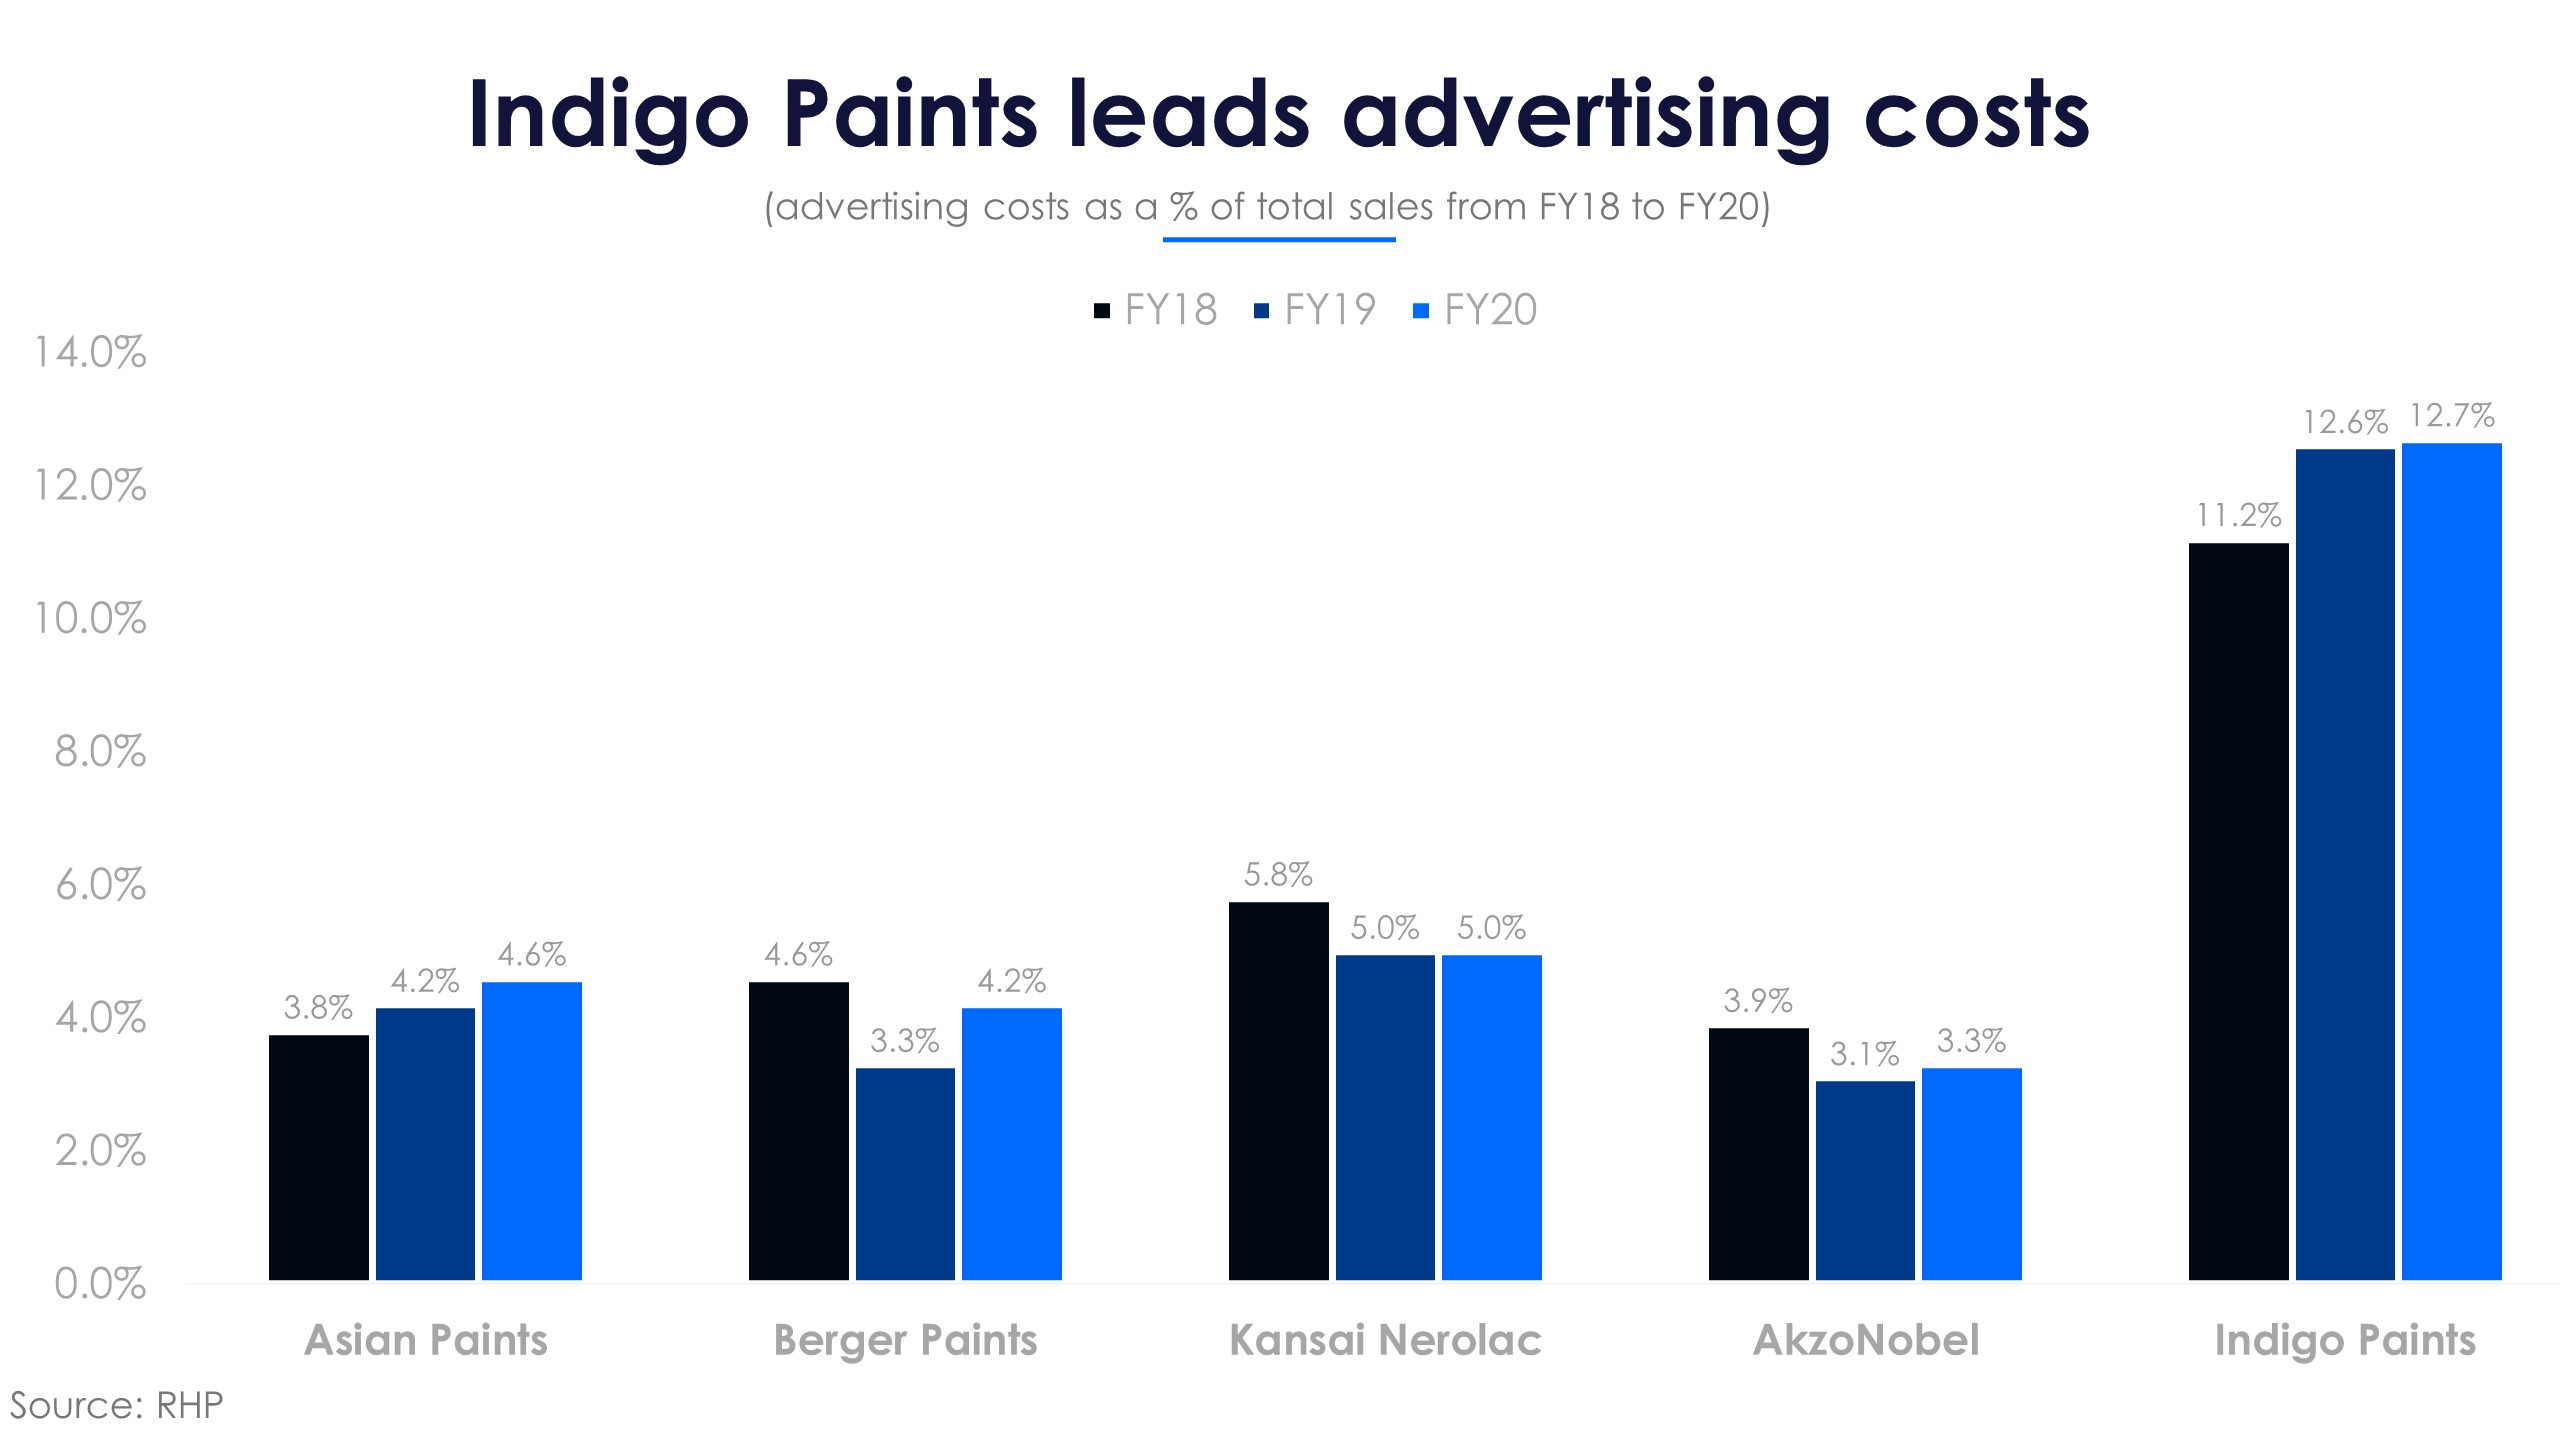 Indigo Paints Advertising